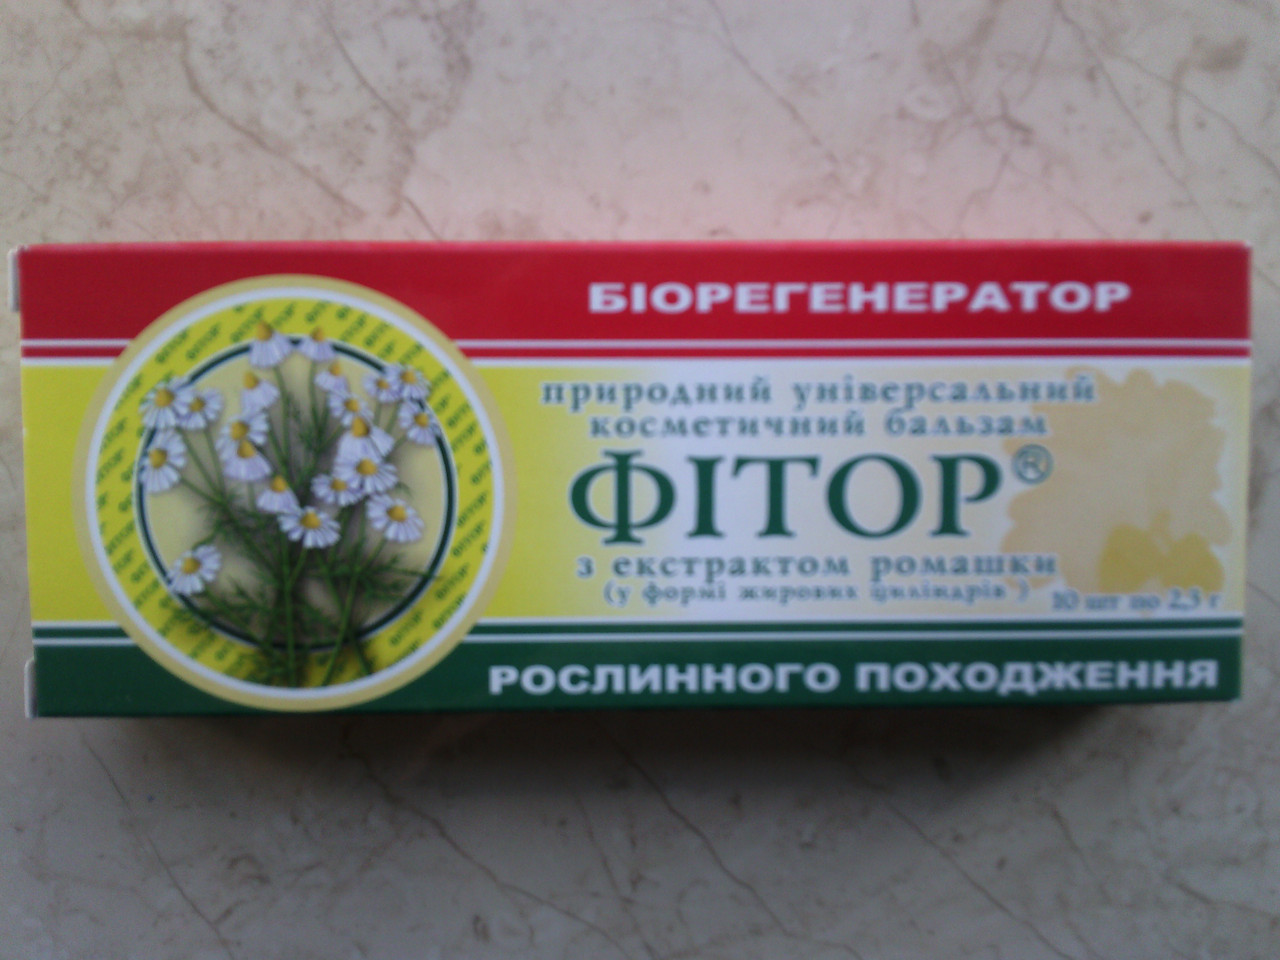 Свечи с фитором и экстрактом ромашки, №10